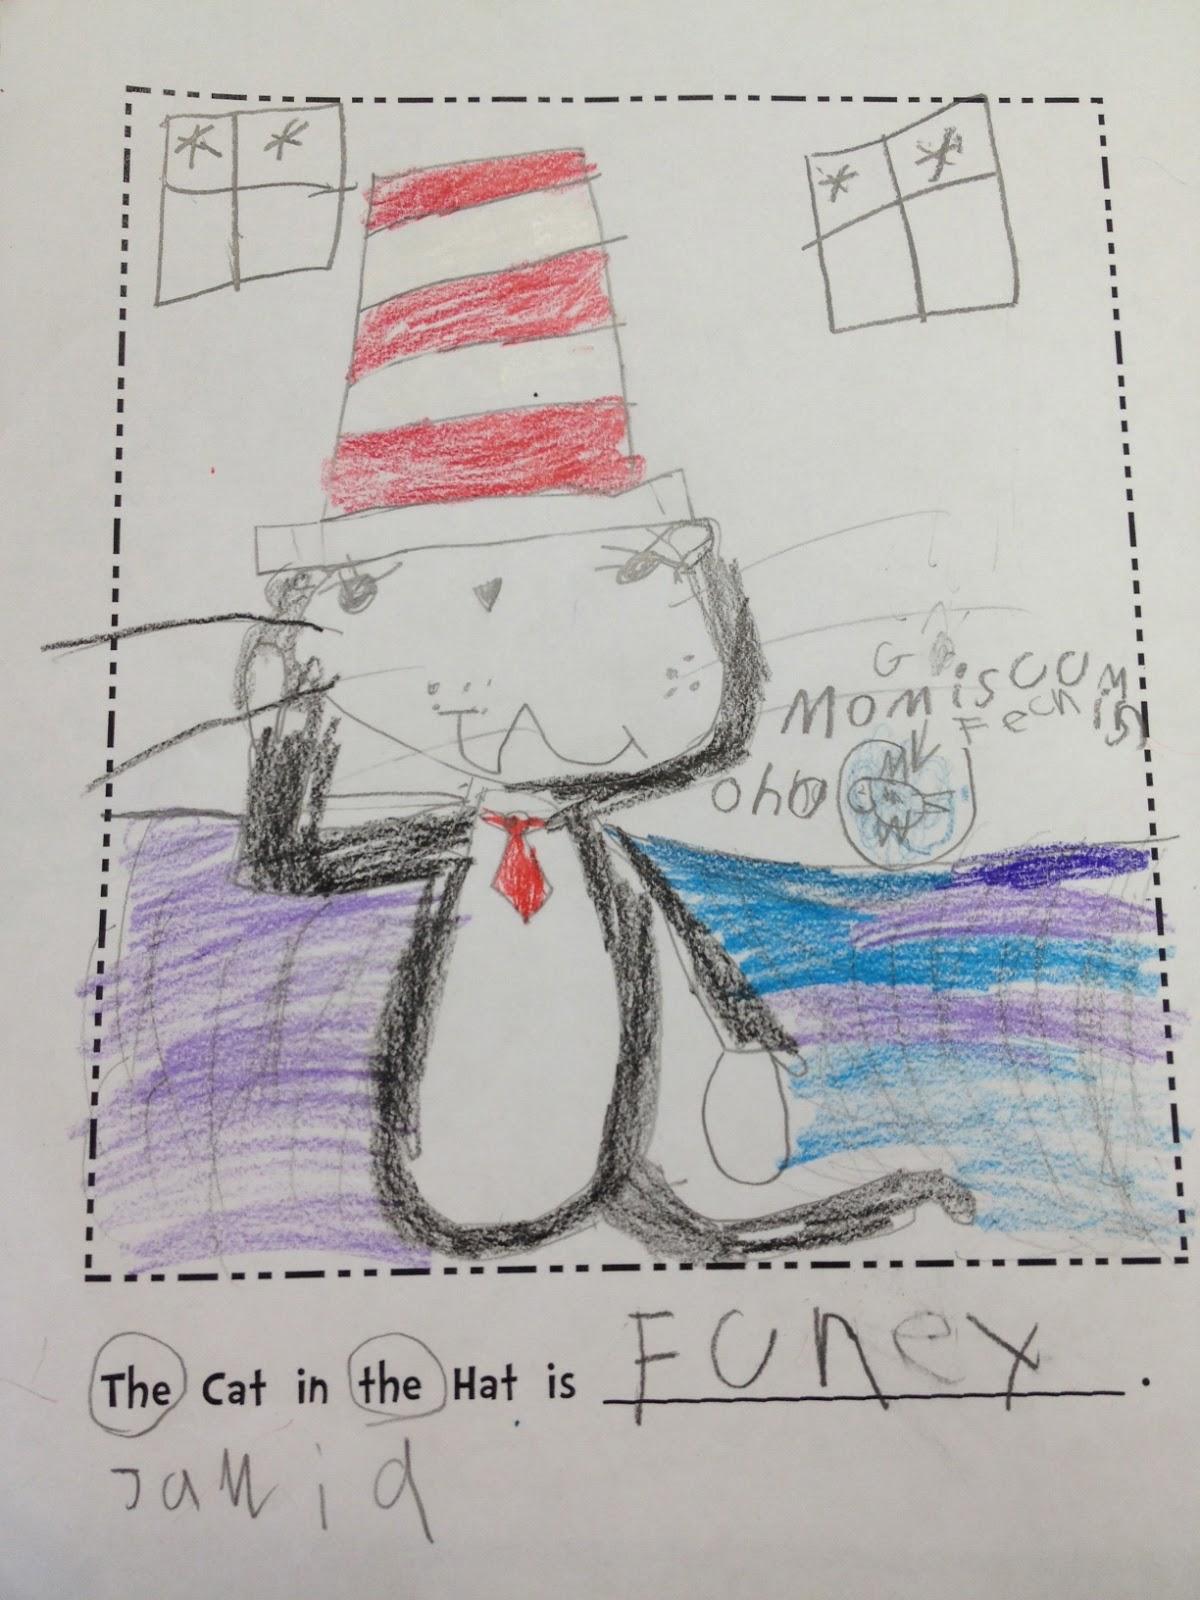 Ms Sangeorzan S Blog The Cat In The Hat